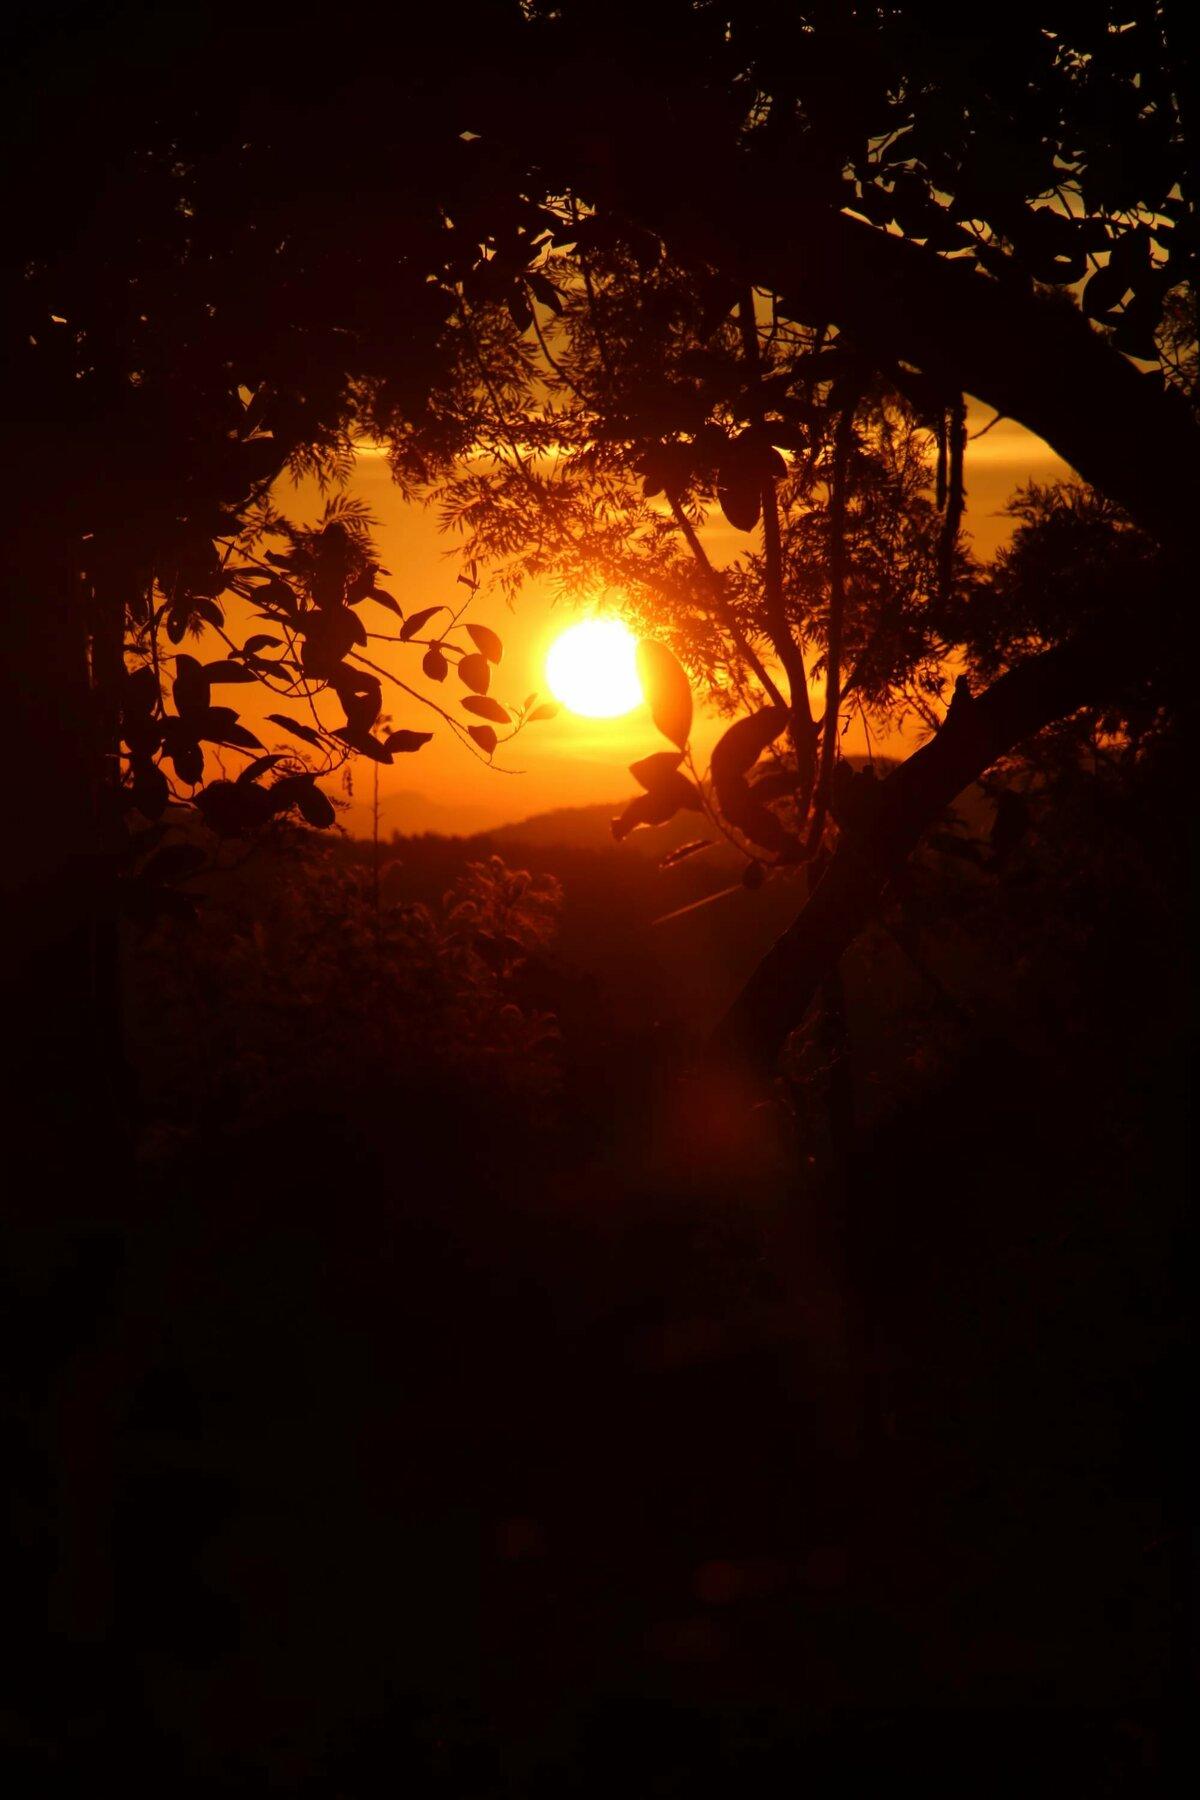 солнце и мрак картинки наступает момент, когда